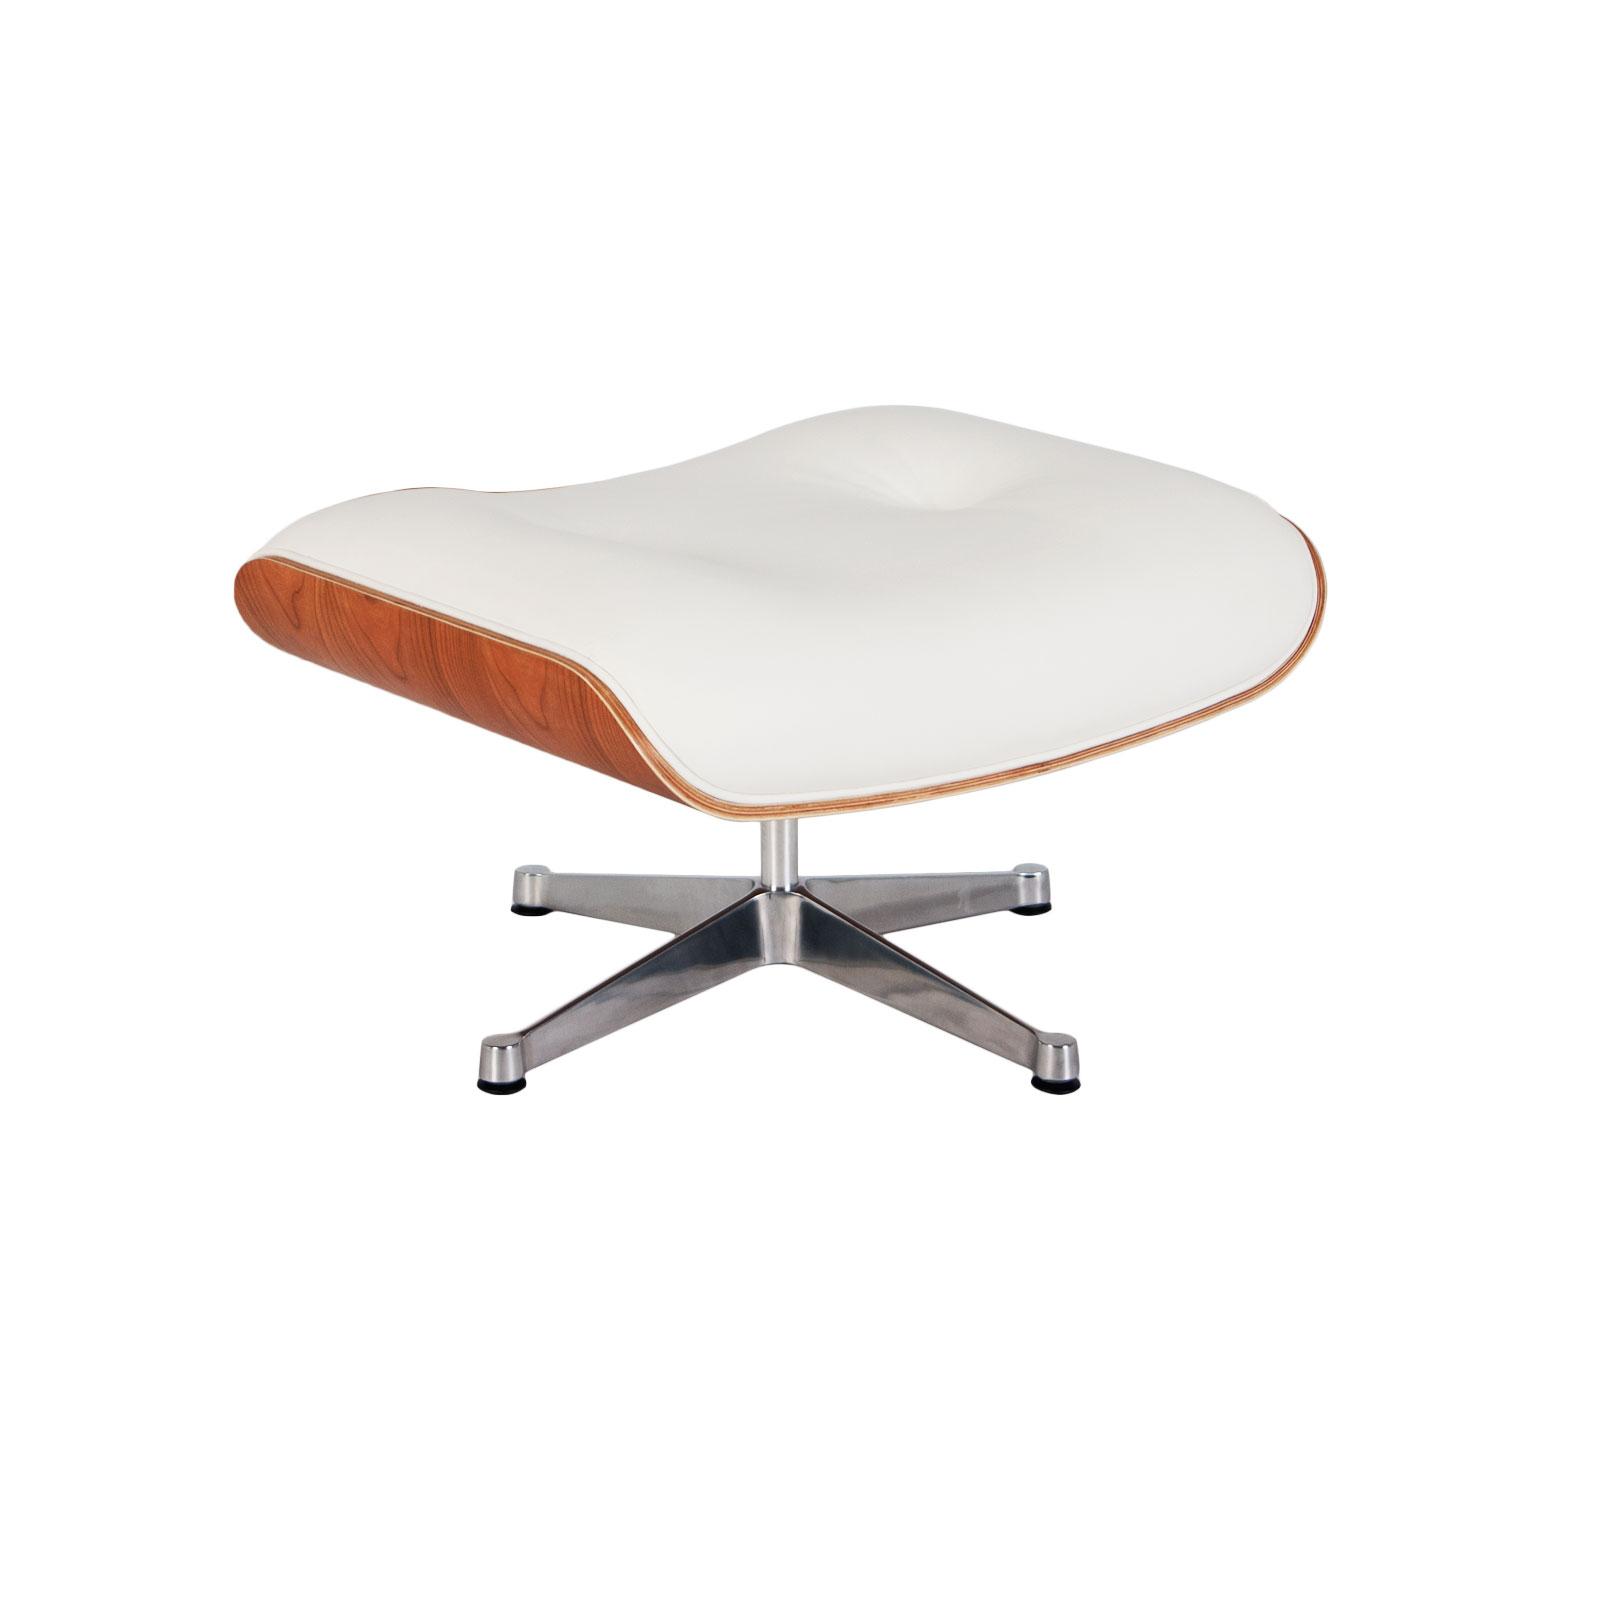 eames lounge chair ottoman formdecor. Black Bedroom Furniture Sets. Home Design Ideas